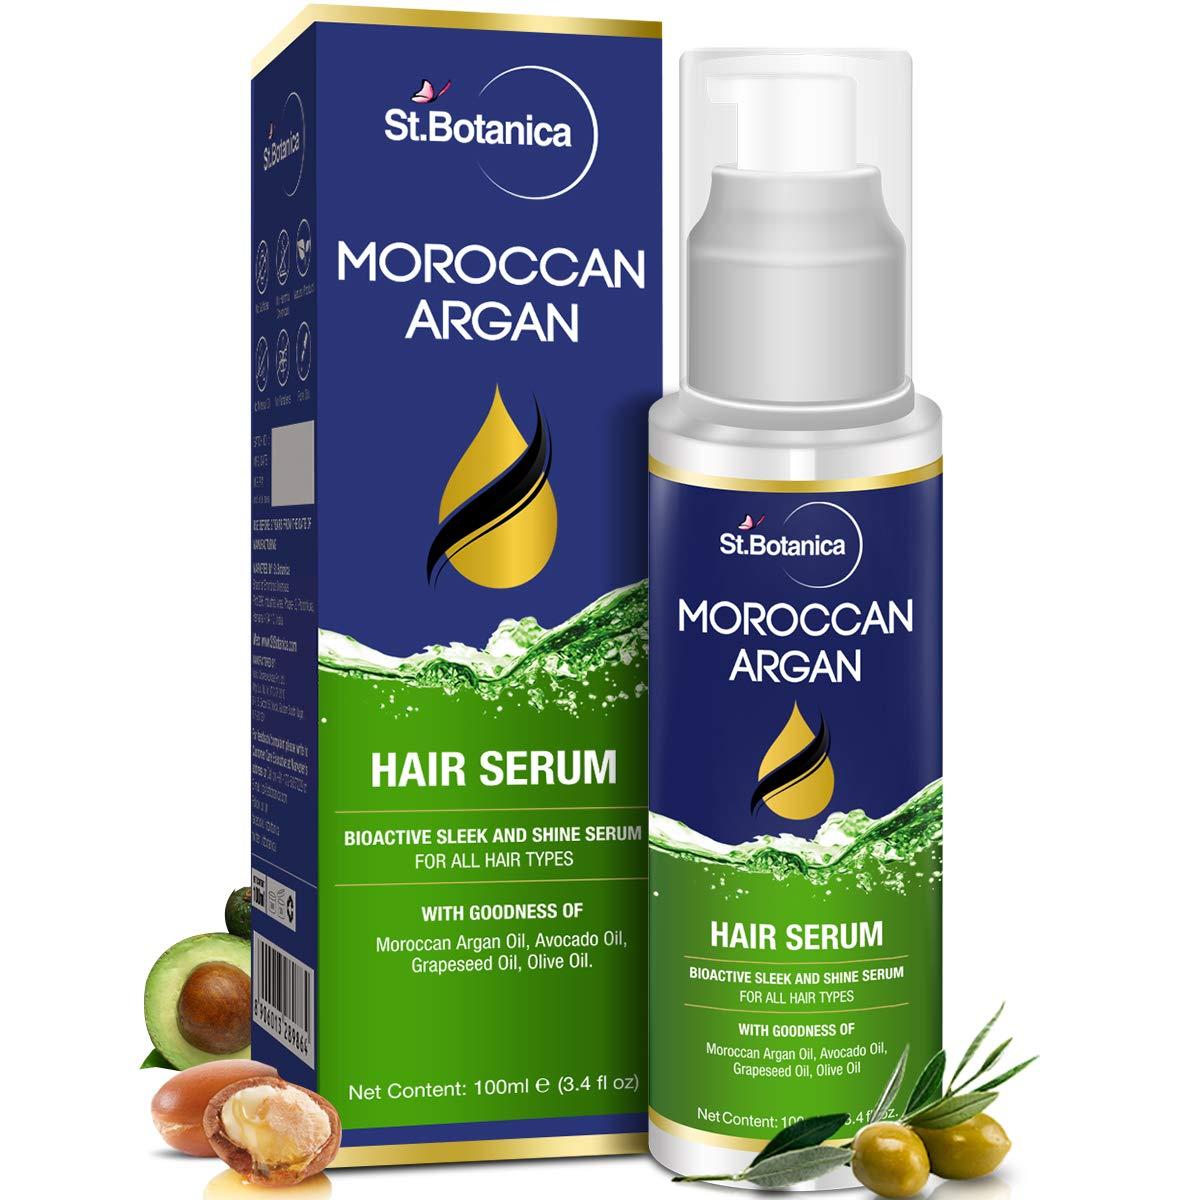 StBotanica Moroccan Argan Hair Serum - Nourishing and Frizz Control Serum (With USDA Organic Argan Oil) 100ml product image